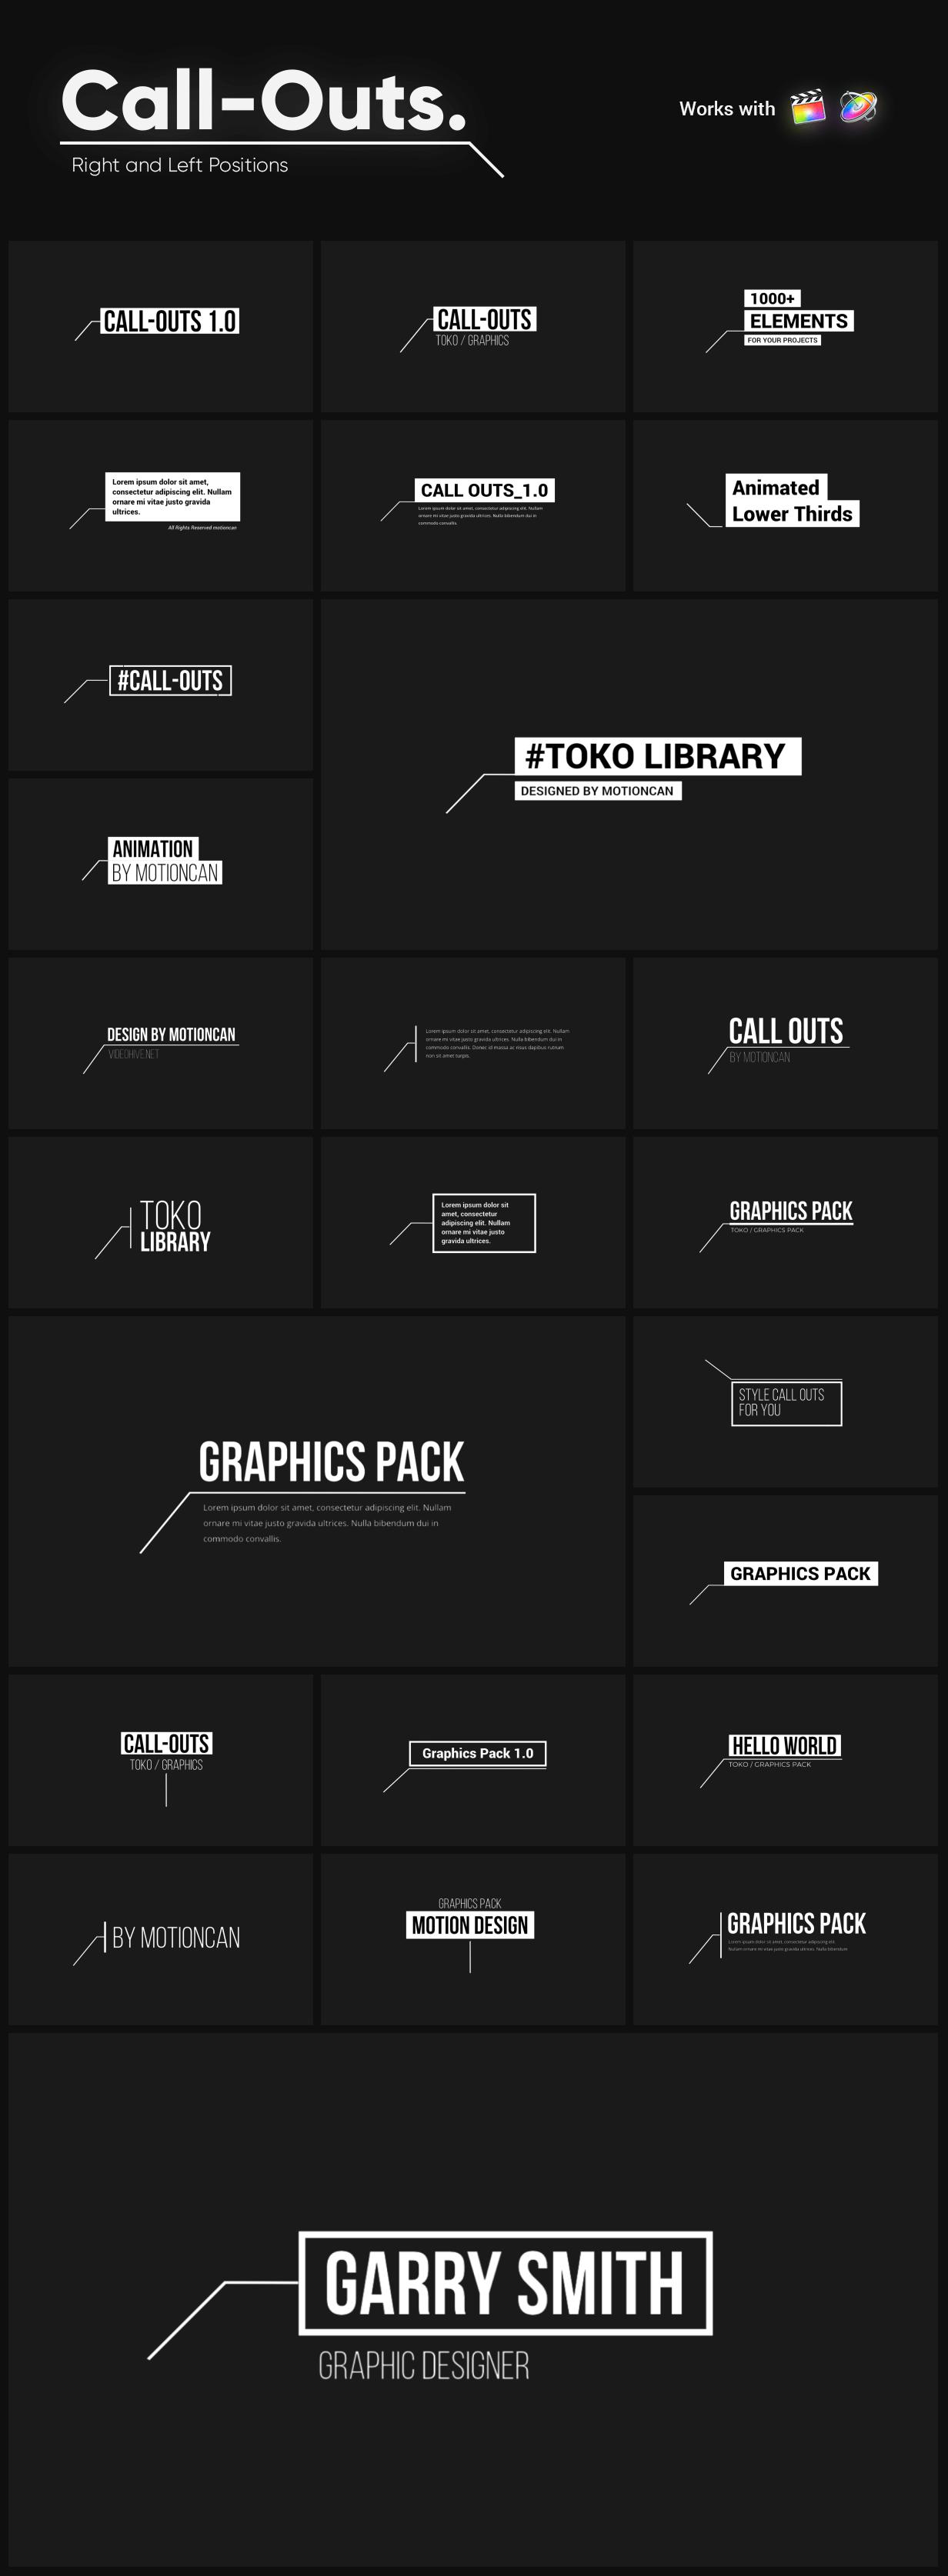 fcpx插件 1449个社交媒体文字标题排版设计LOGO图形背景动画+转场+音效